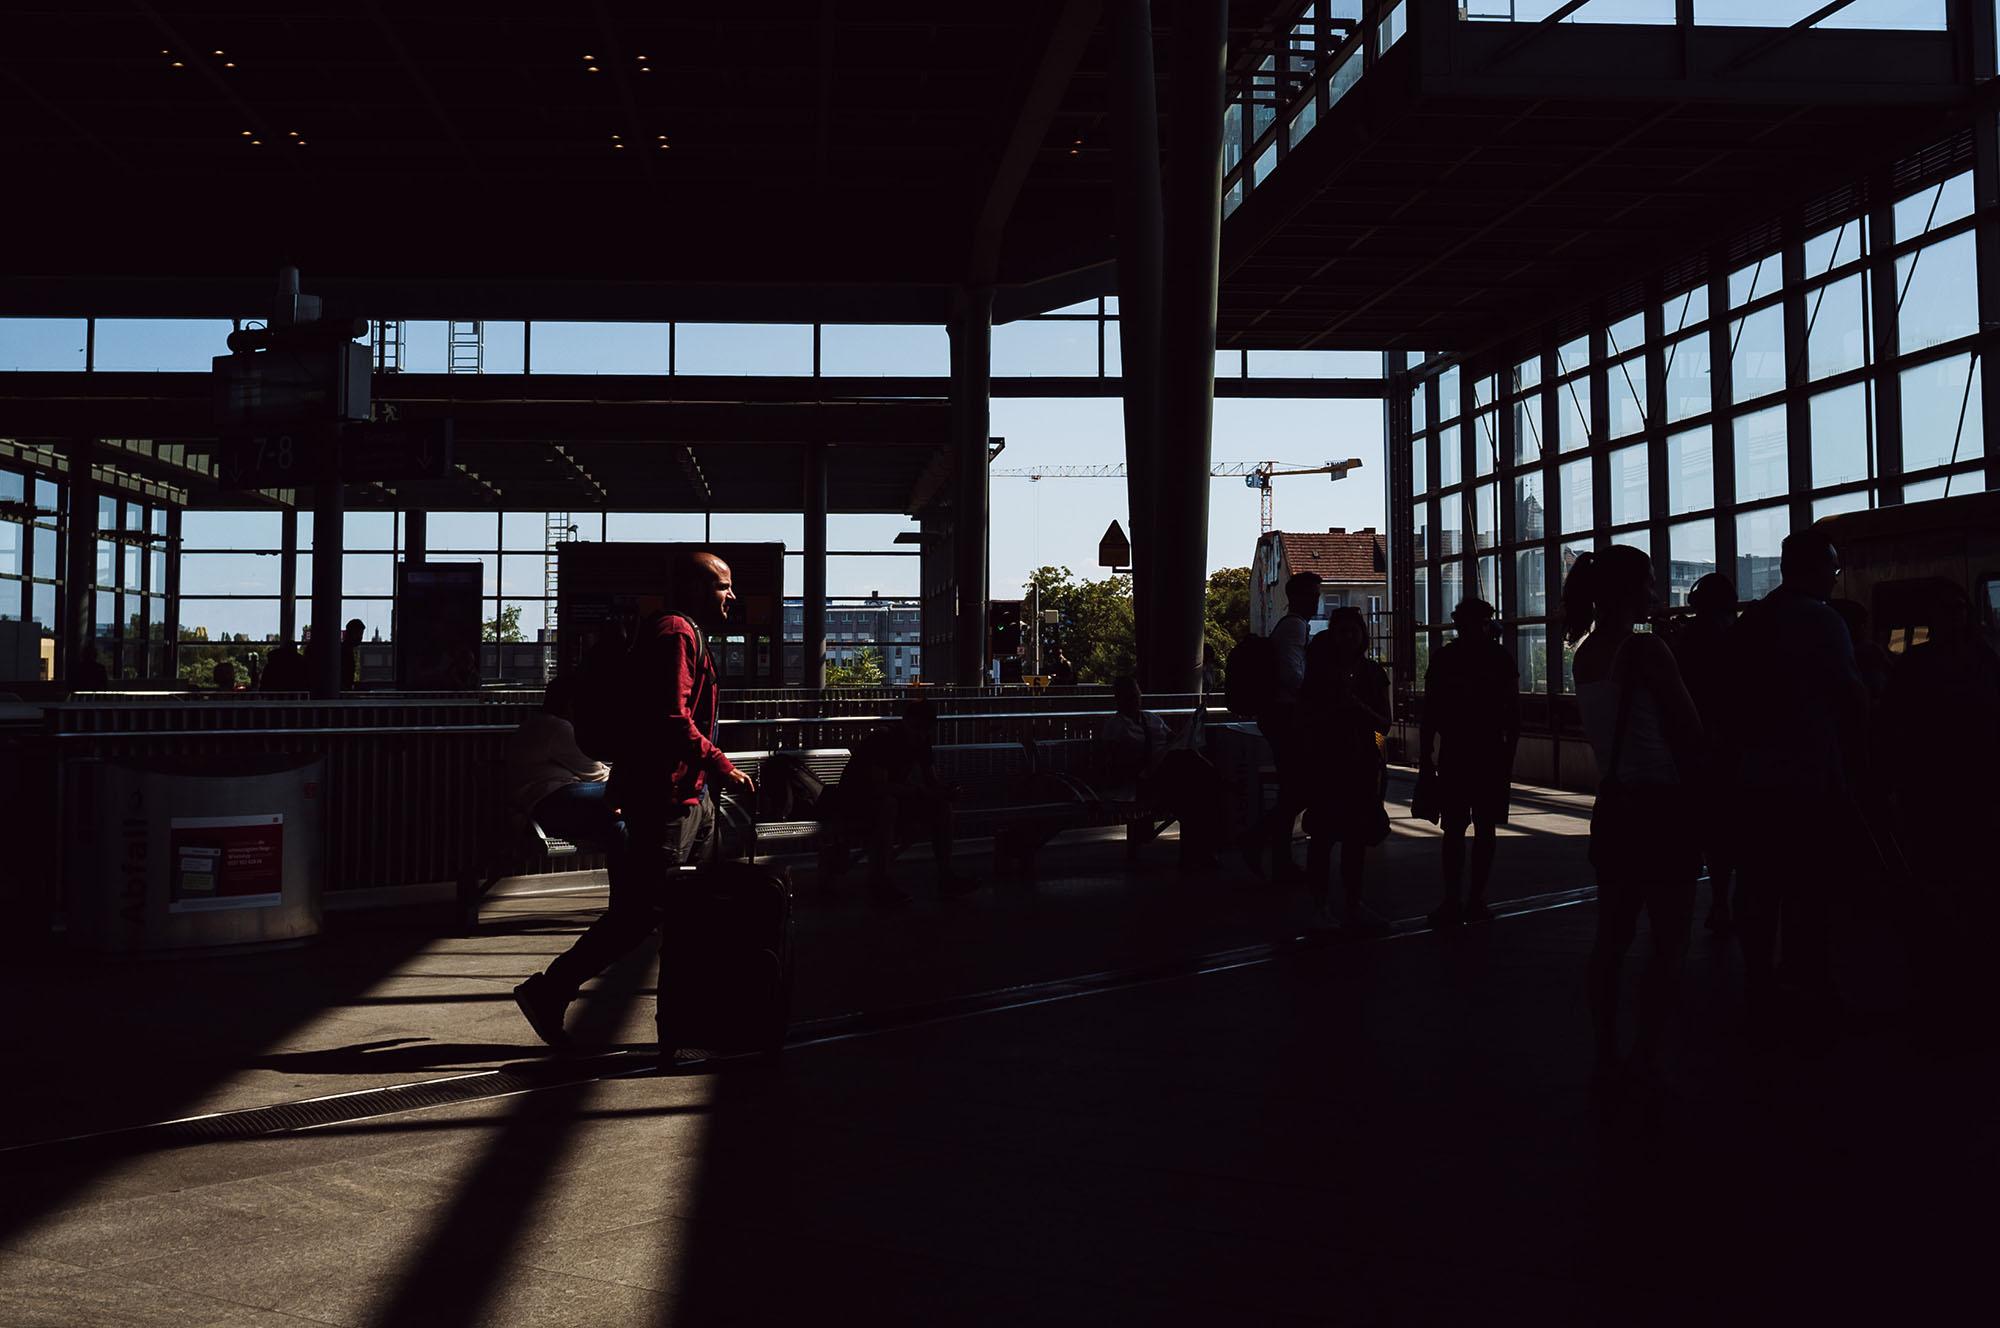 berlin suedkreuz shadowplay